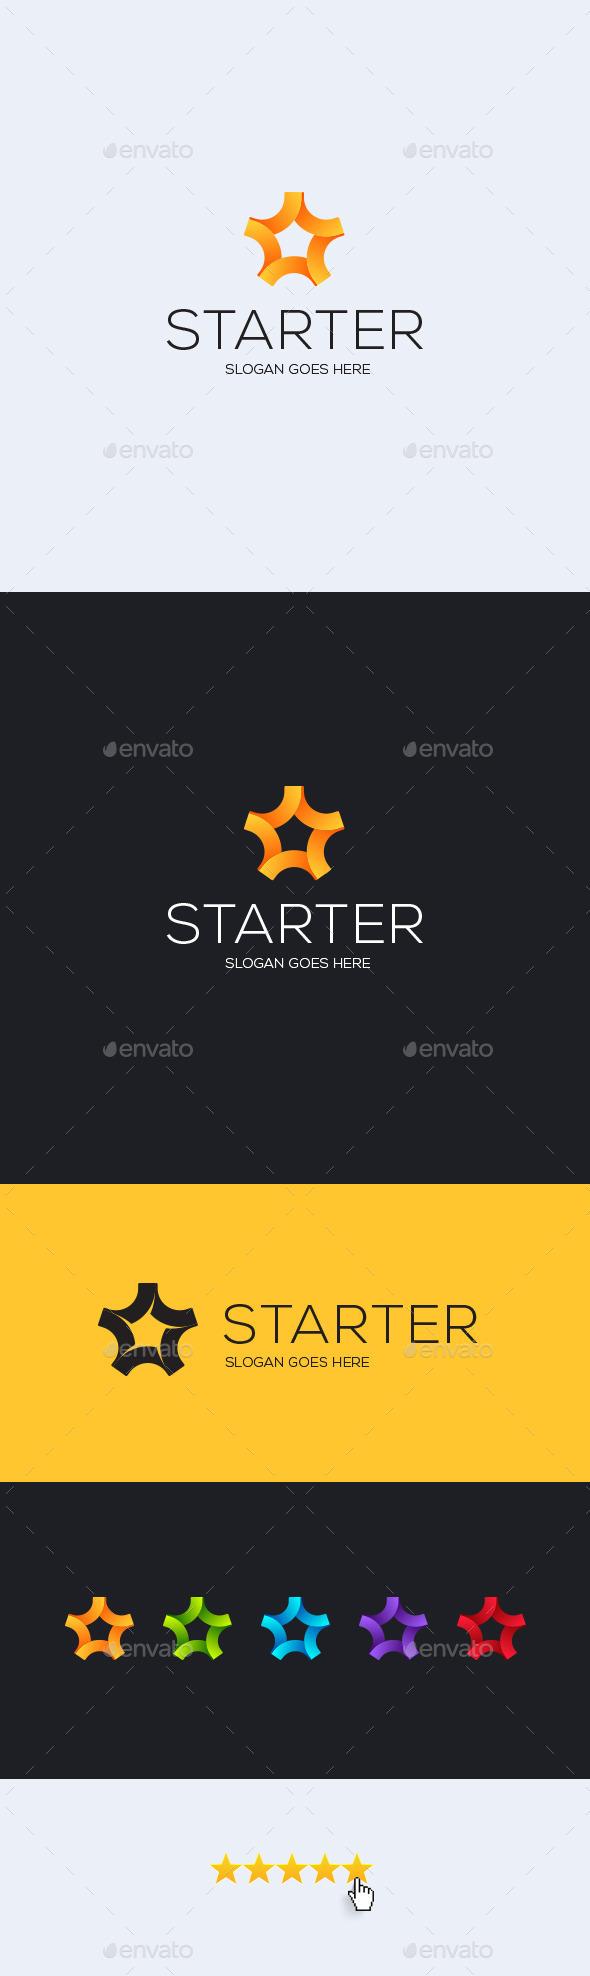 Starter Logo Template - Symbols Logo Templates